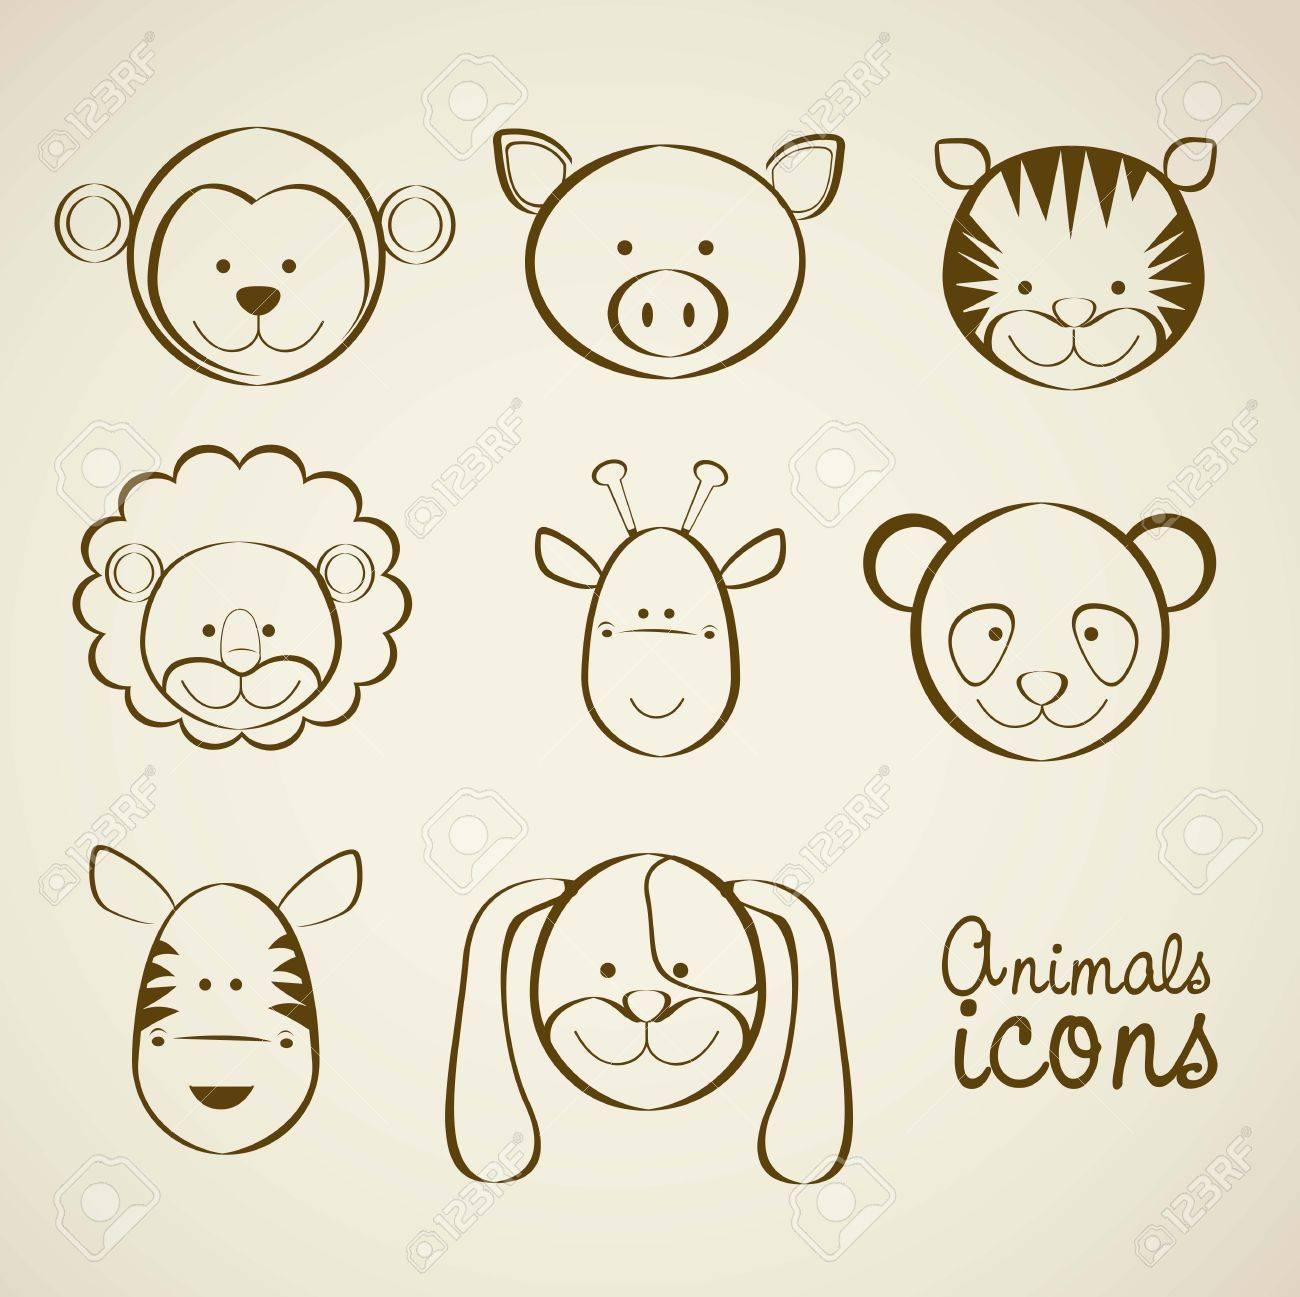 Illustration of animal icons illustration of giraffe, zebra, monkey,  panda, tiger, pig, dog, lion. Stock Vector - 16126095